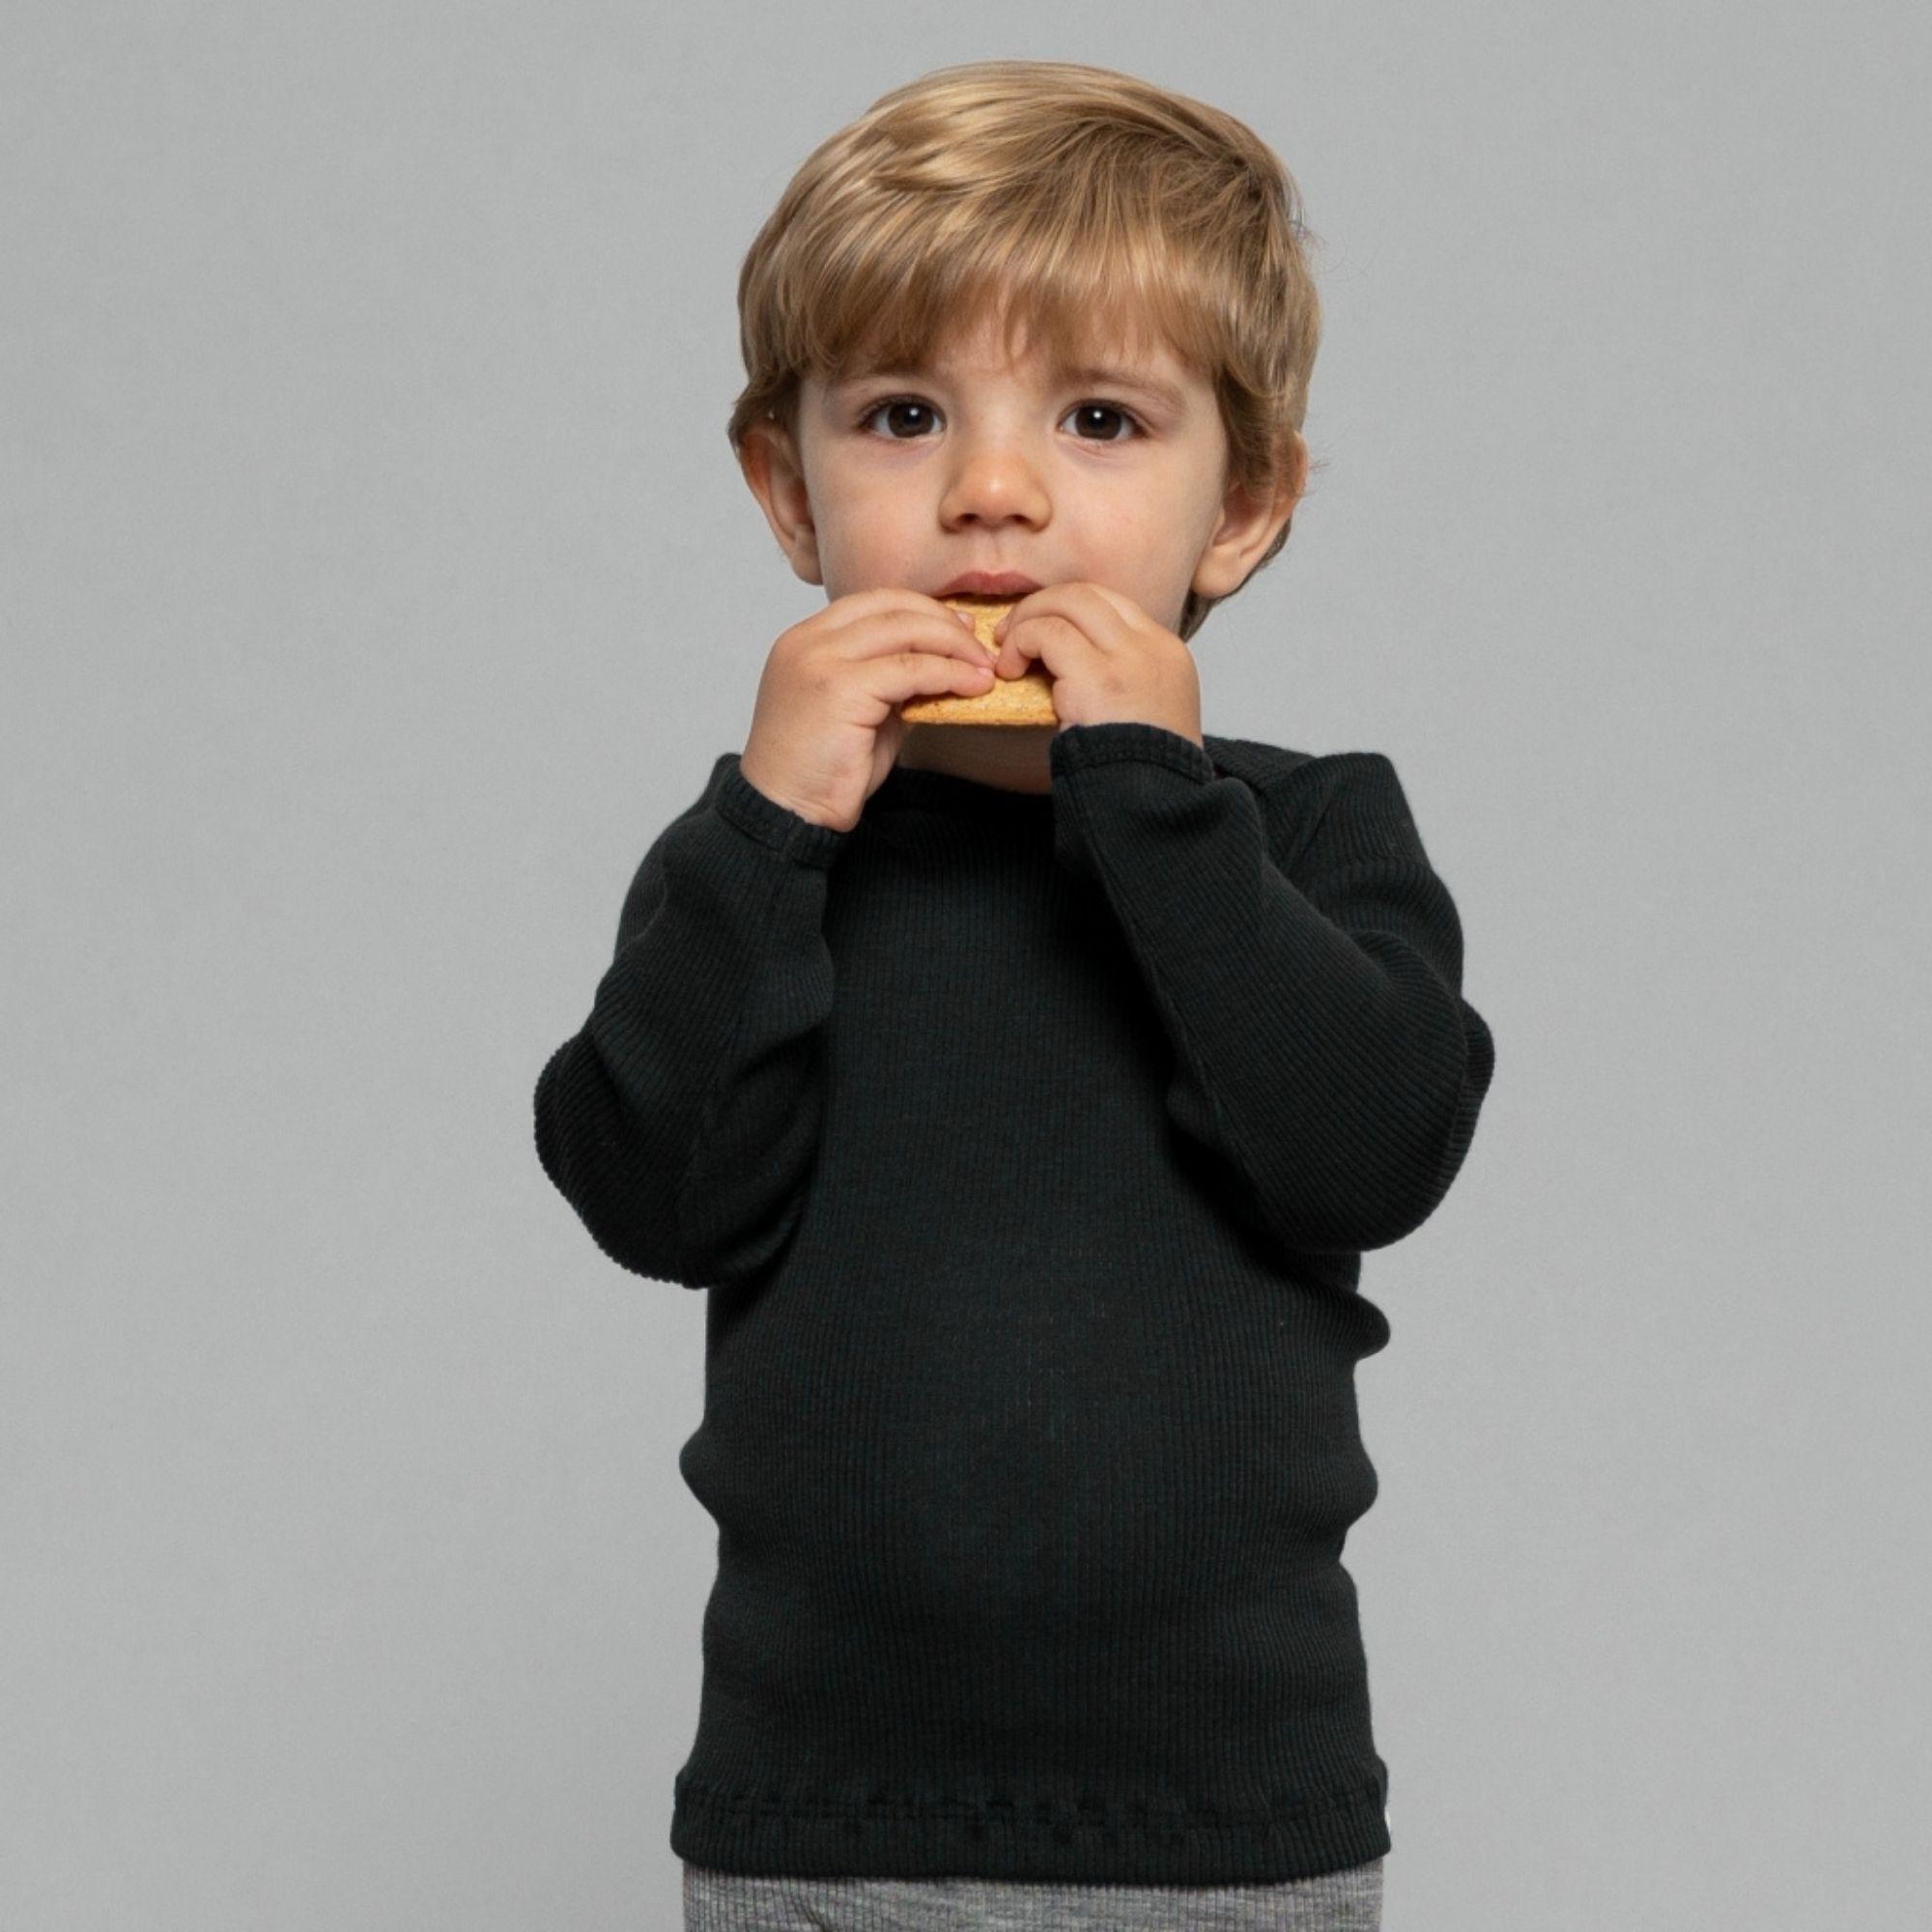 MINIMALISMA - T-shirt bébé - 100 % laine mérinos - Navy teal